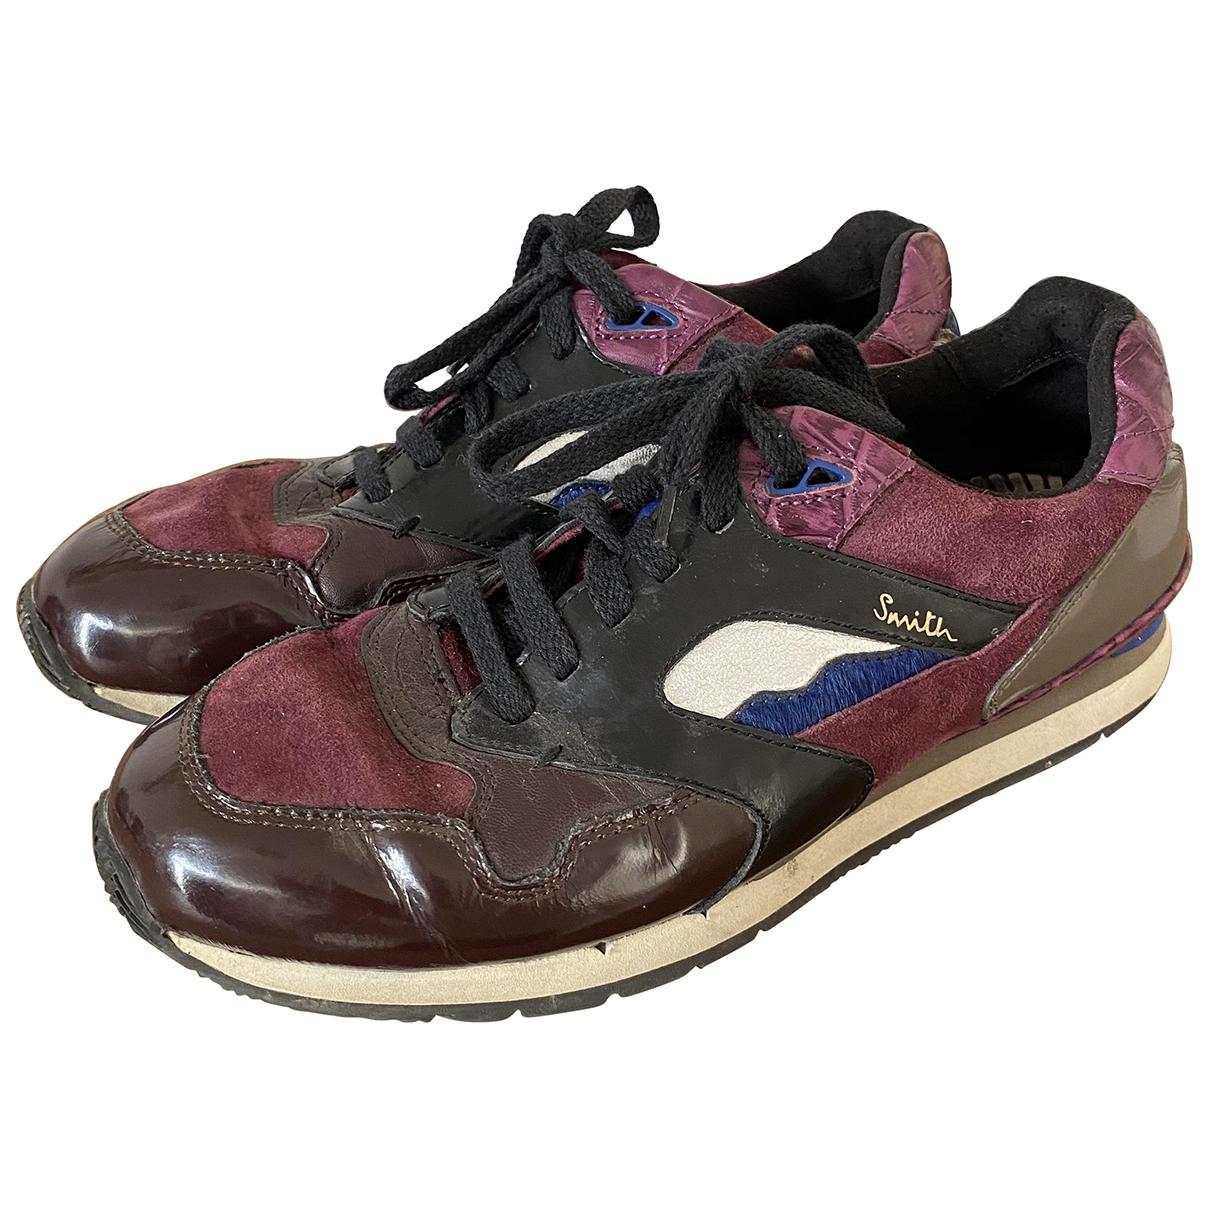 Paul Smith \N Sneakers in  Lila Leder